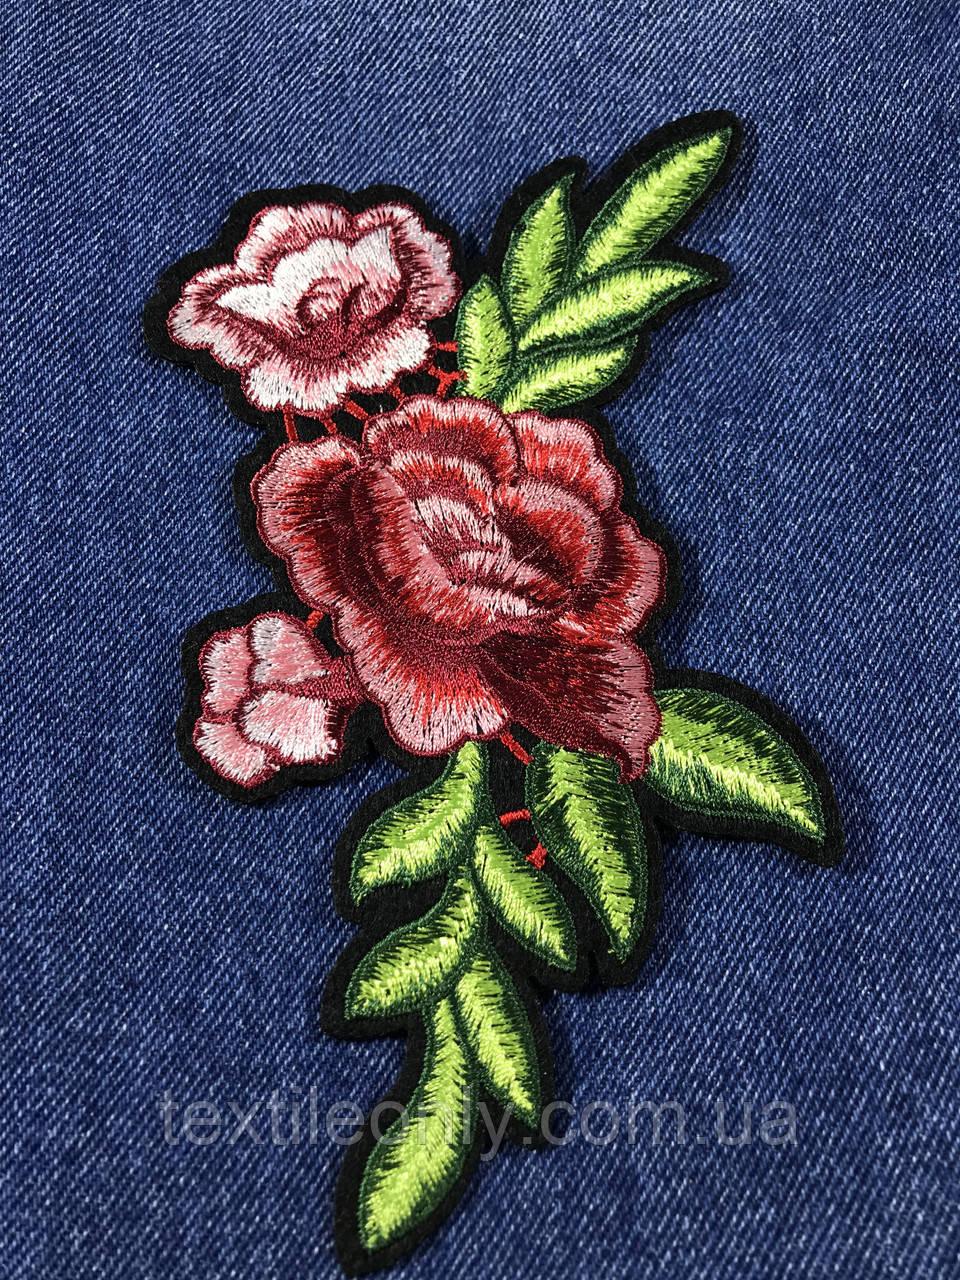 Нашивка Роза 3 бутона красно-розовая 120х185 мм